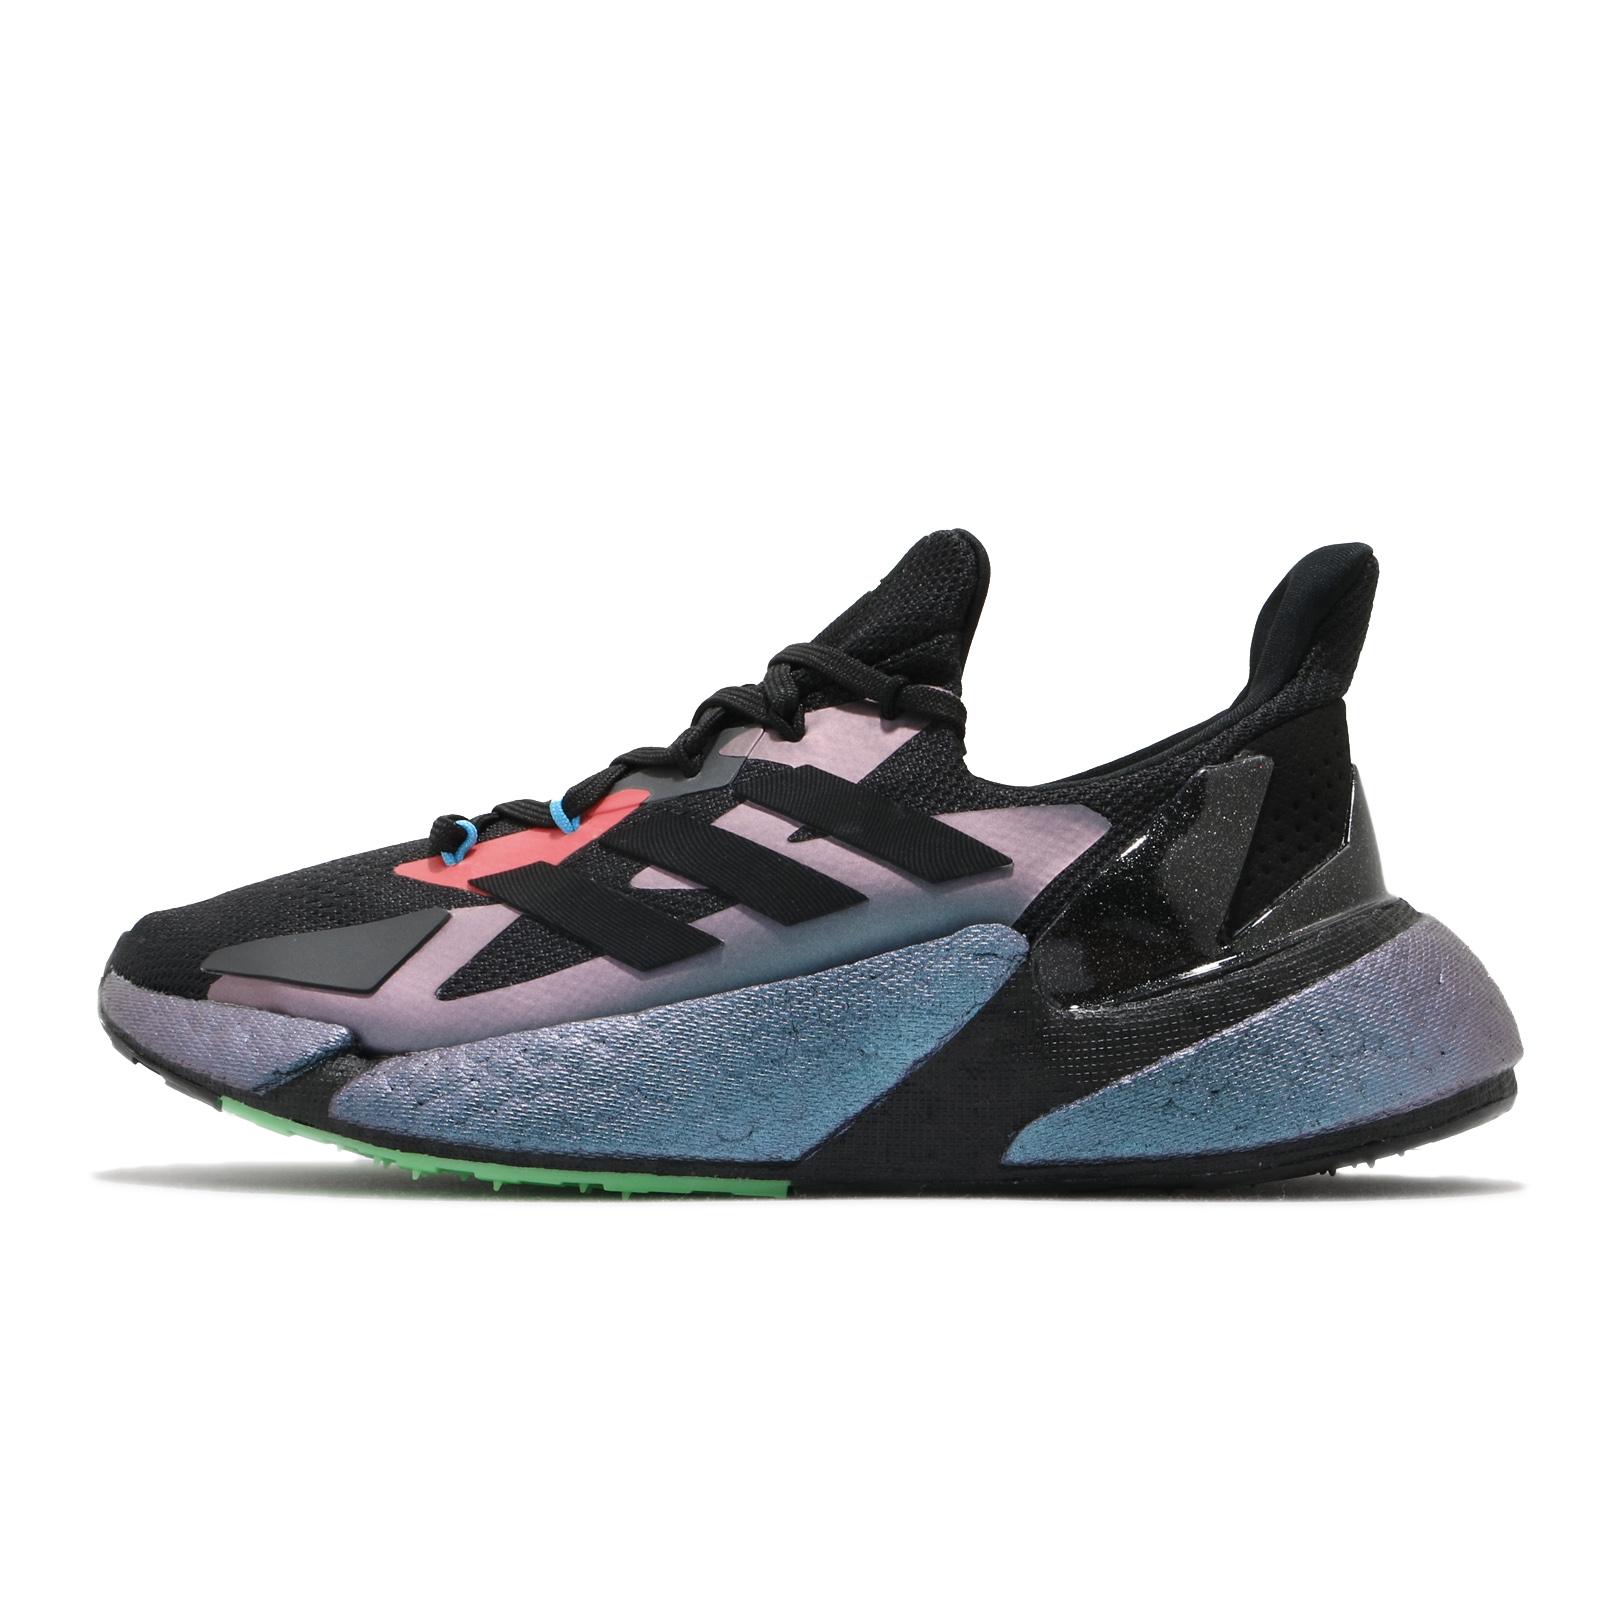 adidas 慢跑鞋 X9000 L4 黑 藍 紫 金屬光澤 愛迪達 男鞋 女鞋 BOOST 【ACS】 FW4910